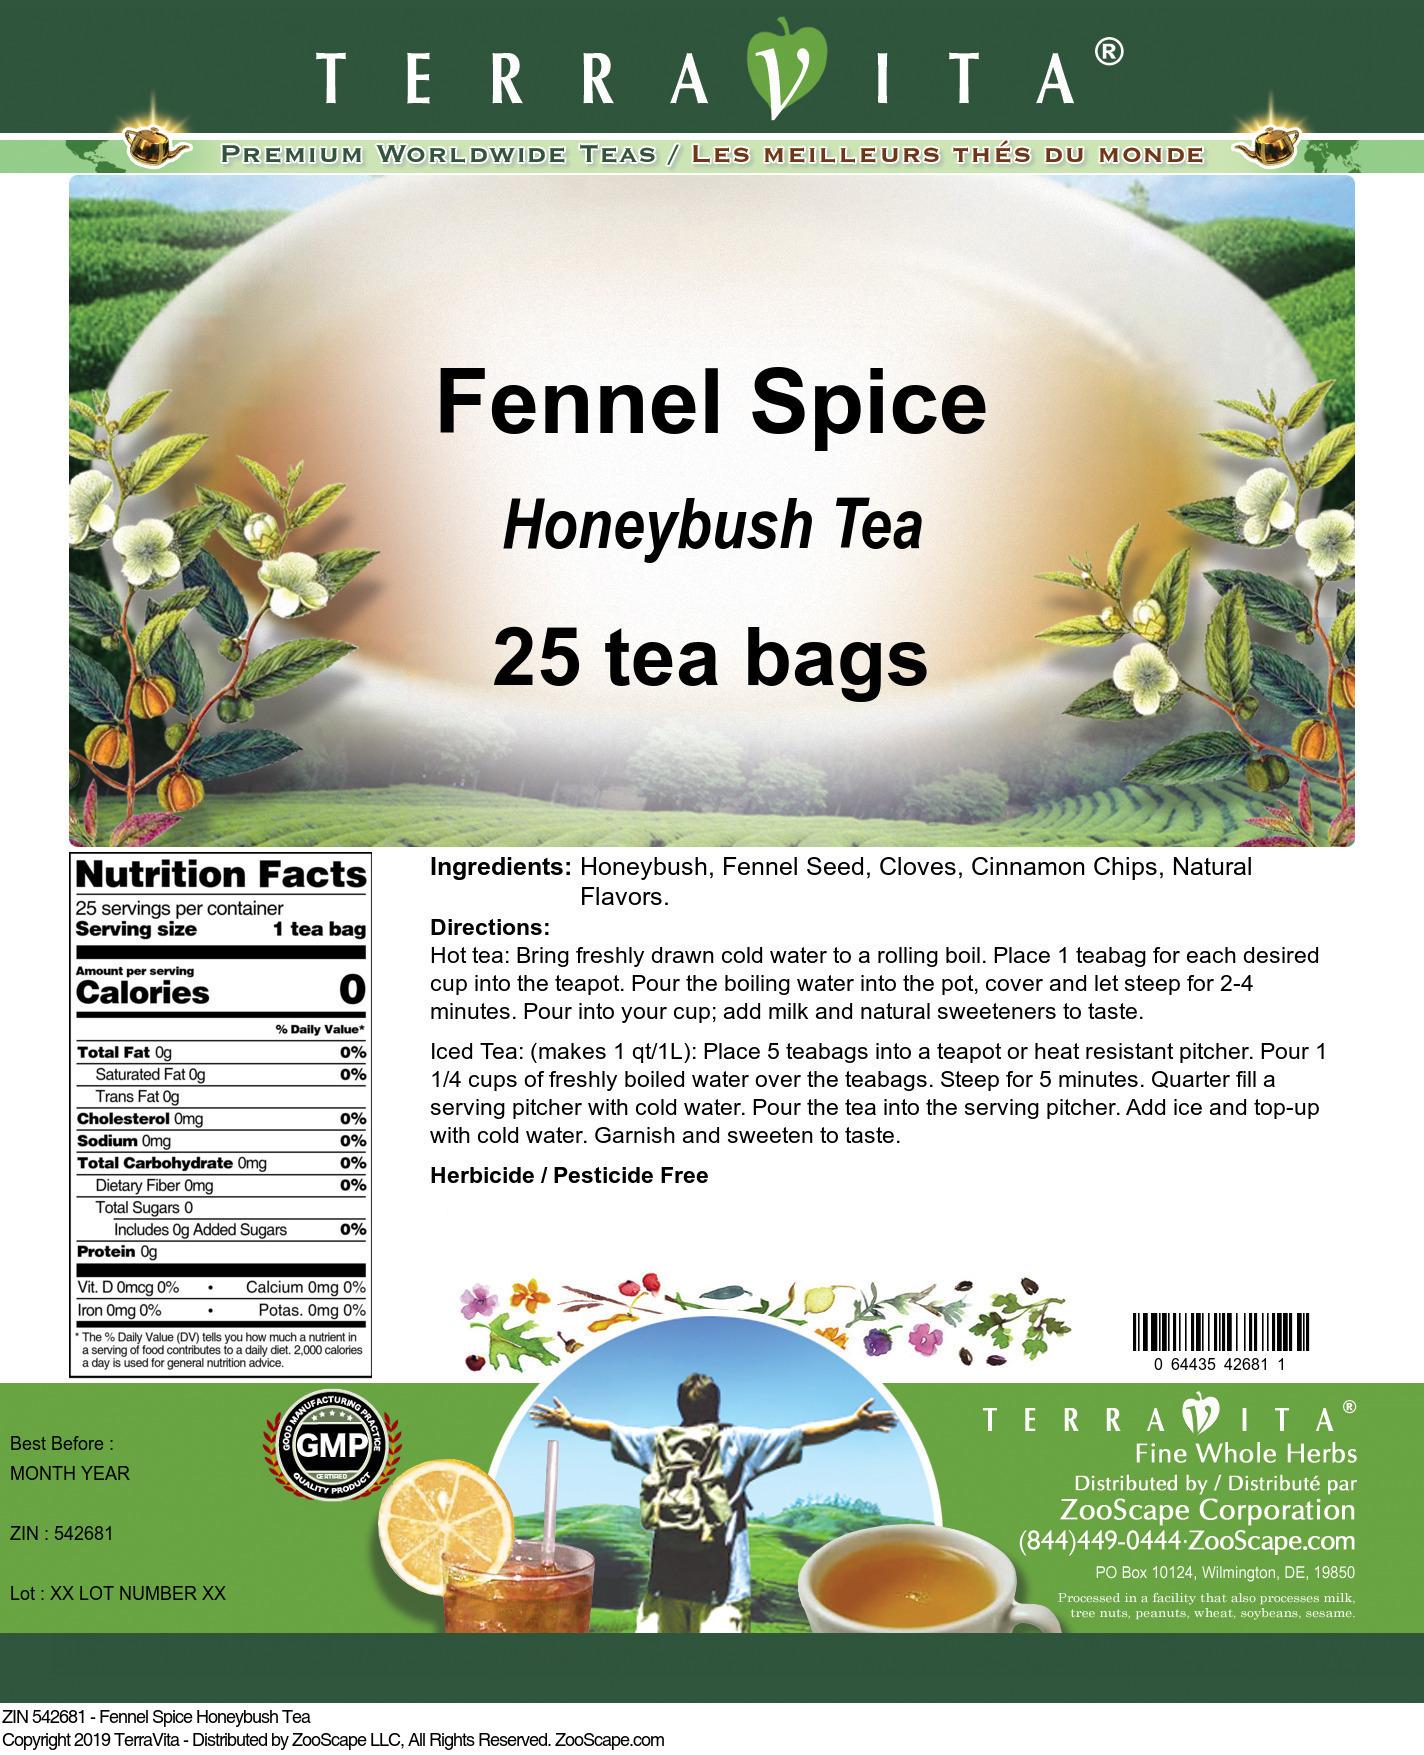 Fennel Spice Honeybush Tea